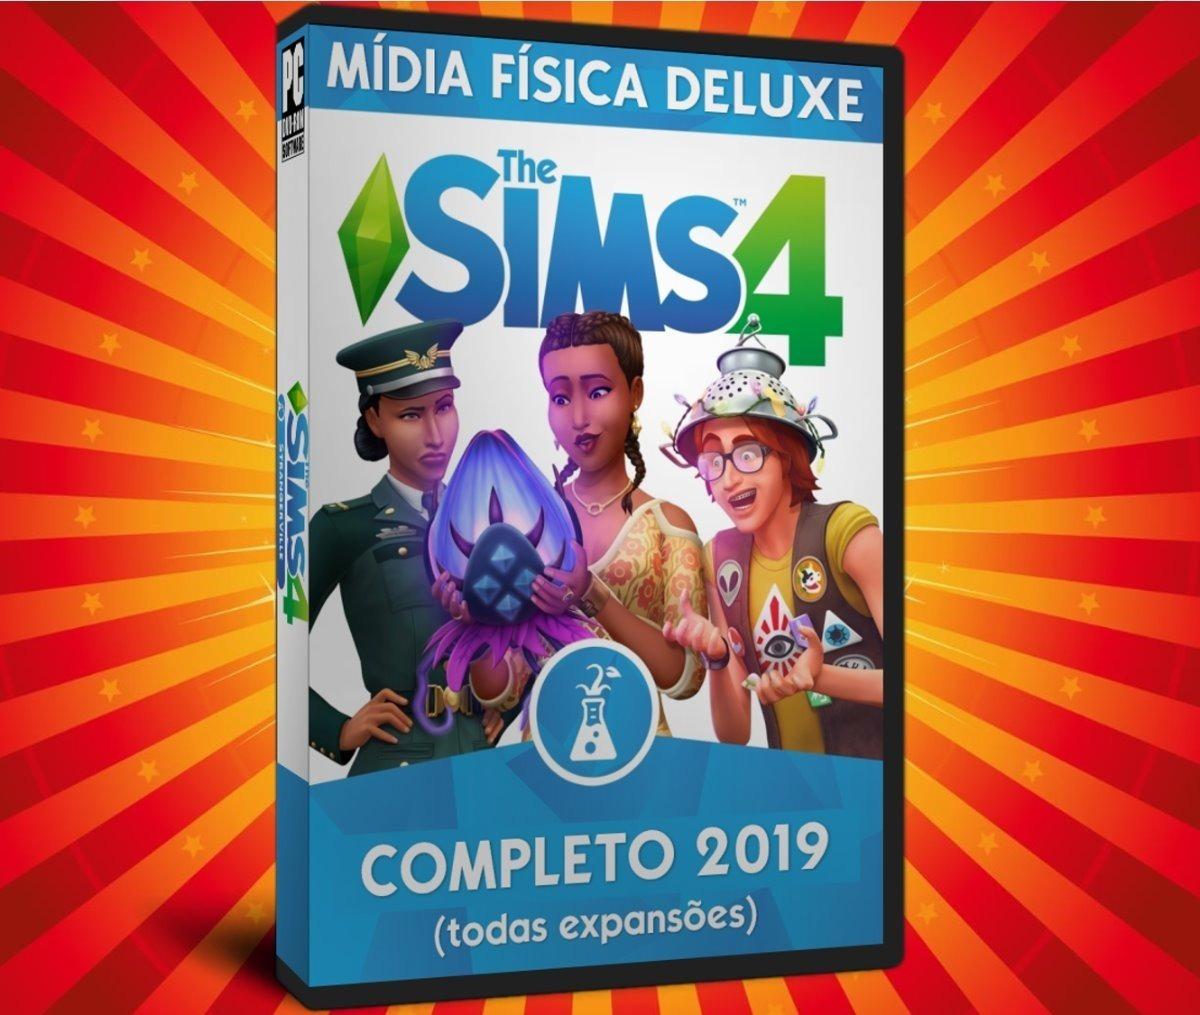 the sims 4 download gratis para pc em portugues completo 2019